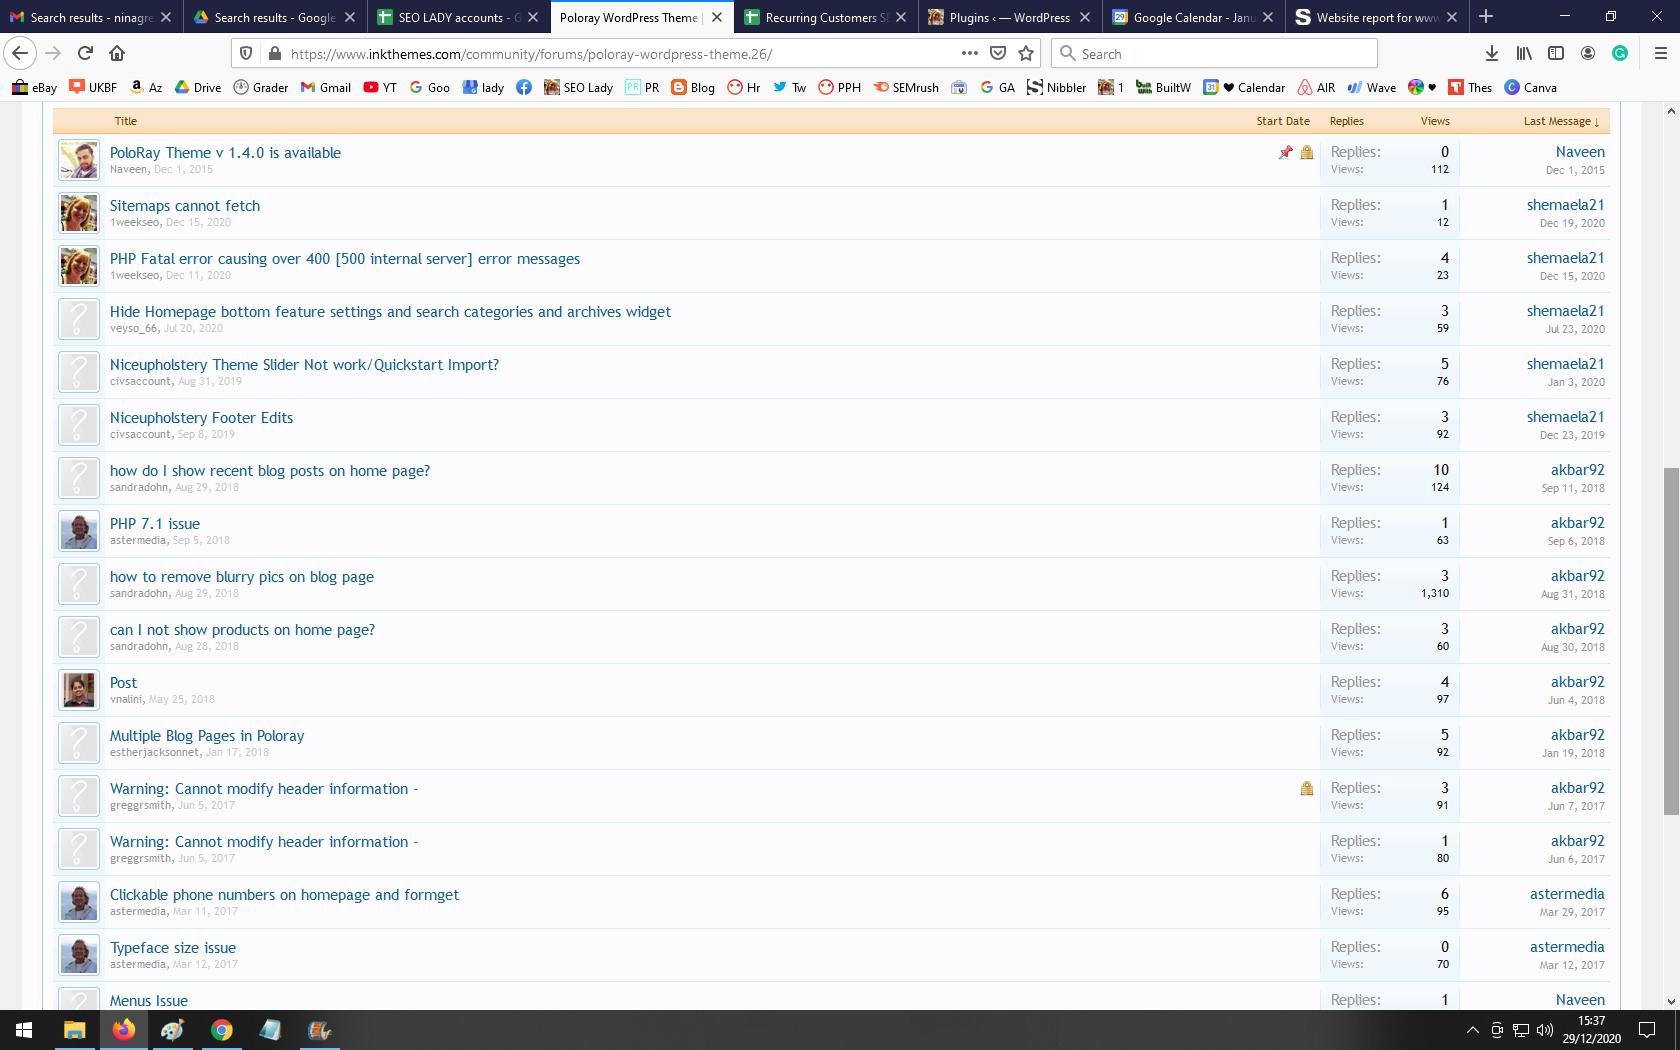 Poloray Wordpress Theme Customizer Broken Not Working Core Update December 2020